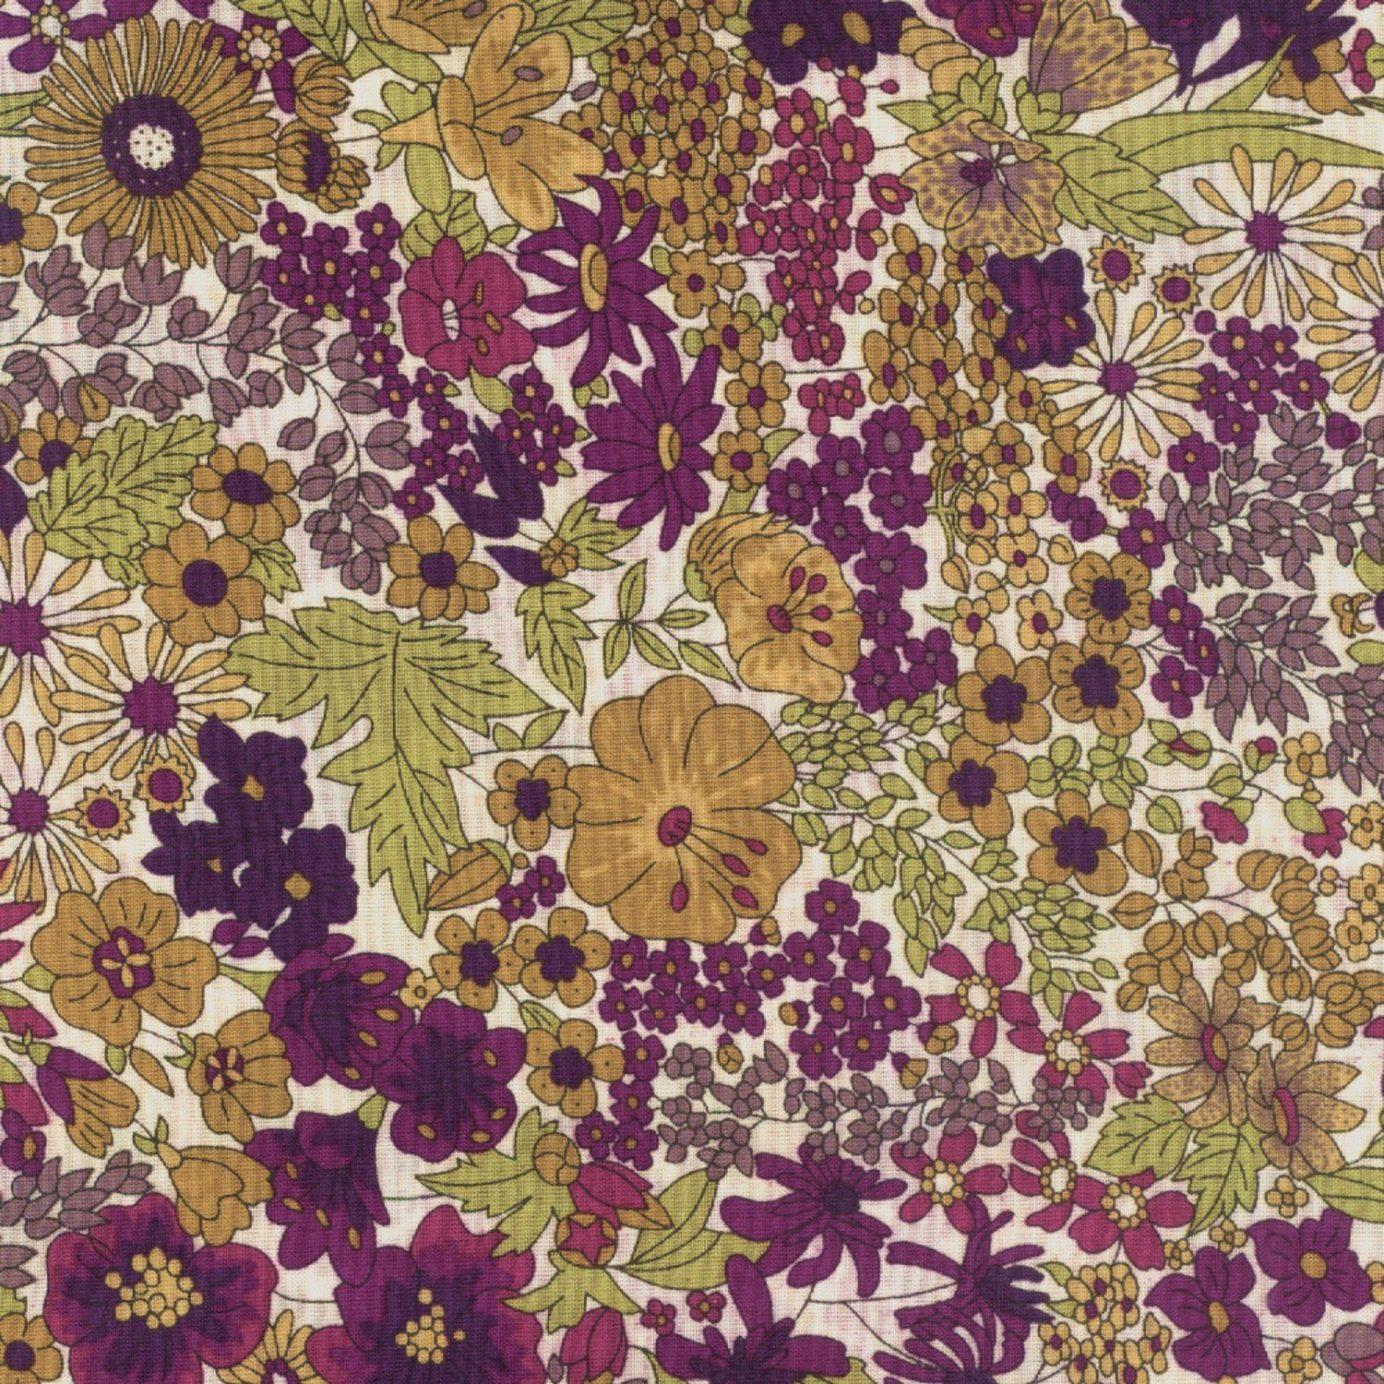 liberty-tana-lawn-fabric-margaret-annie-c